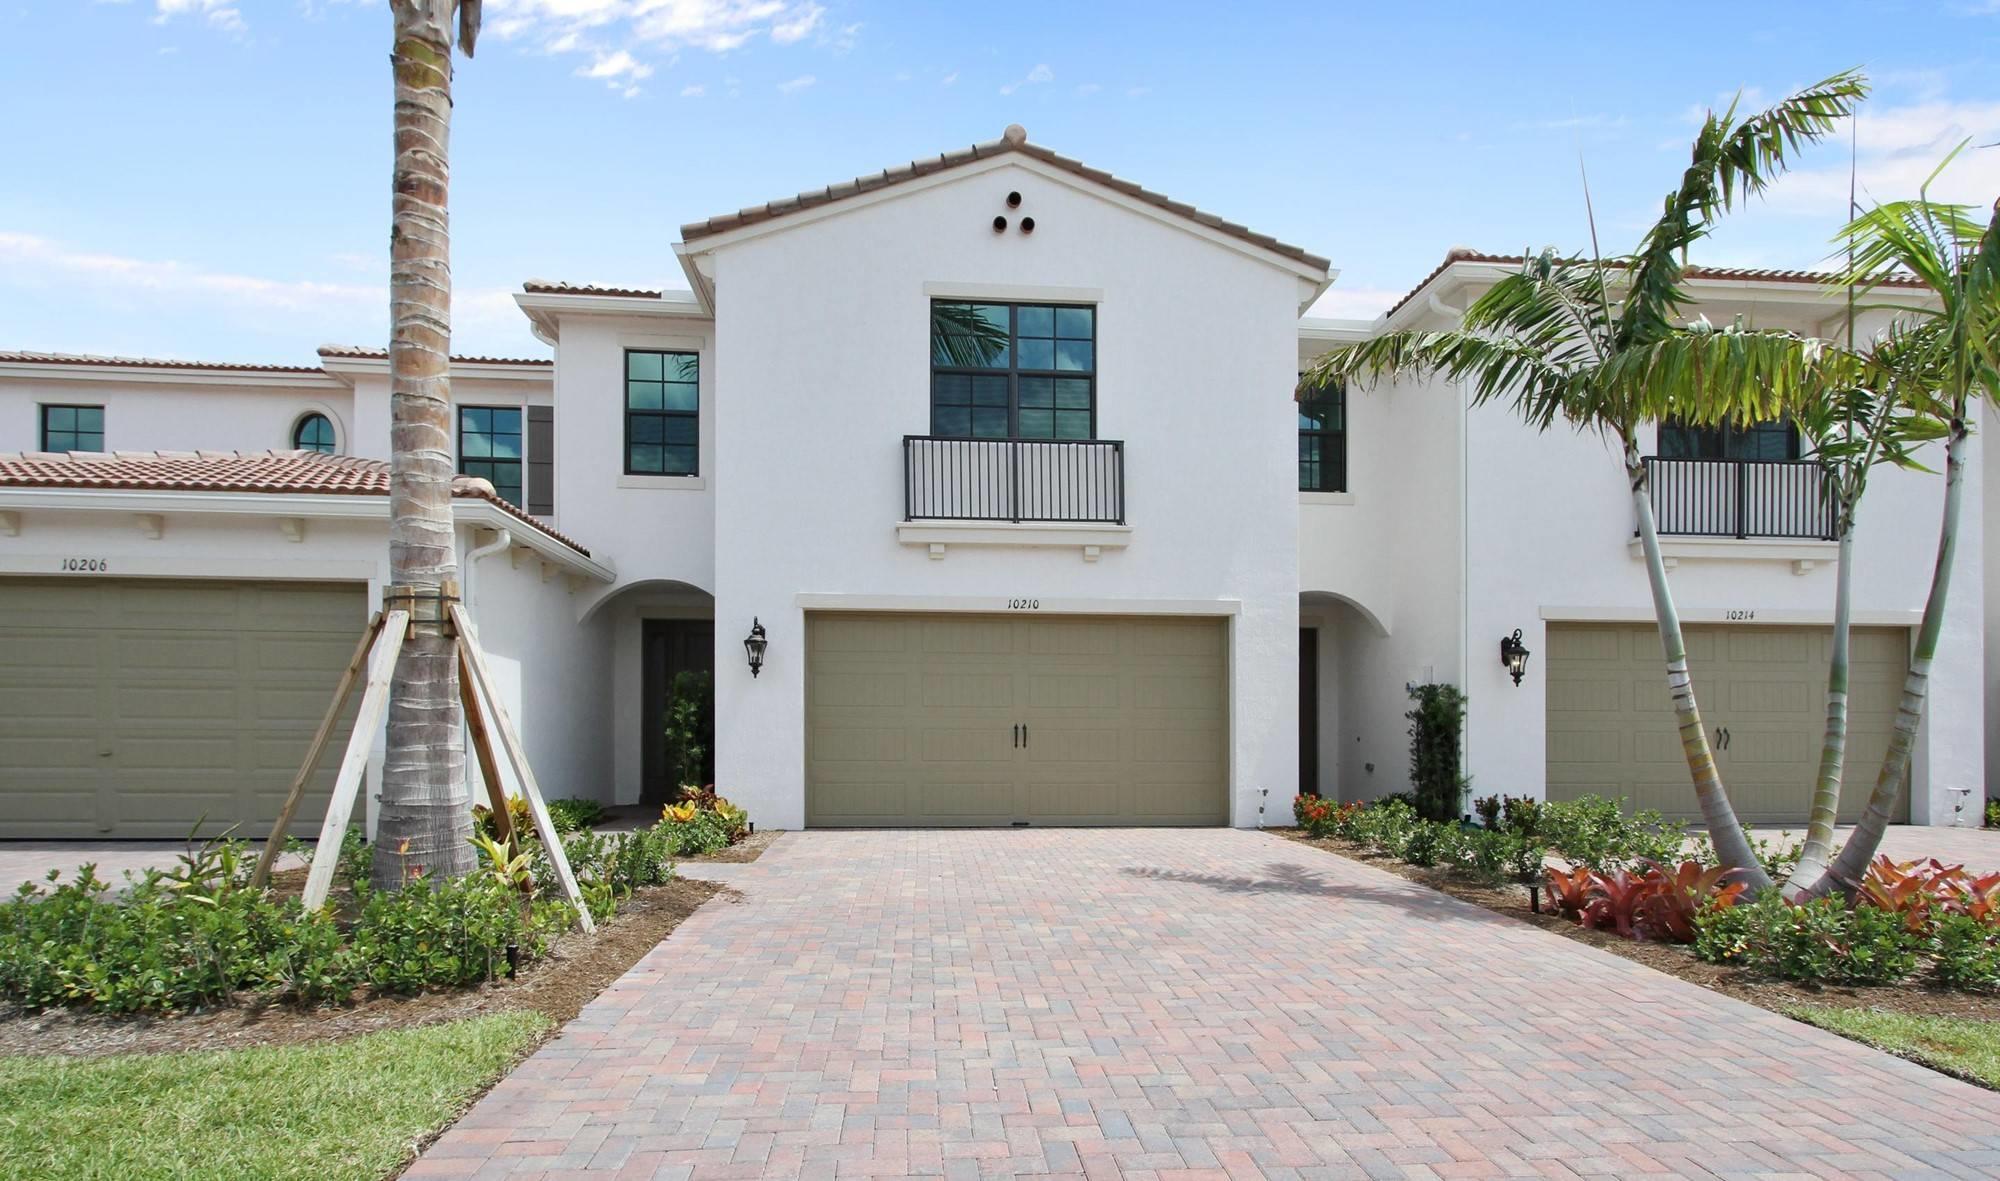 10085  Brickhill Drive 136 For Sale 10642357, FL